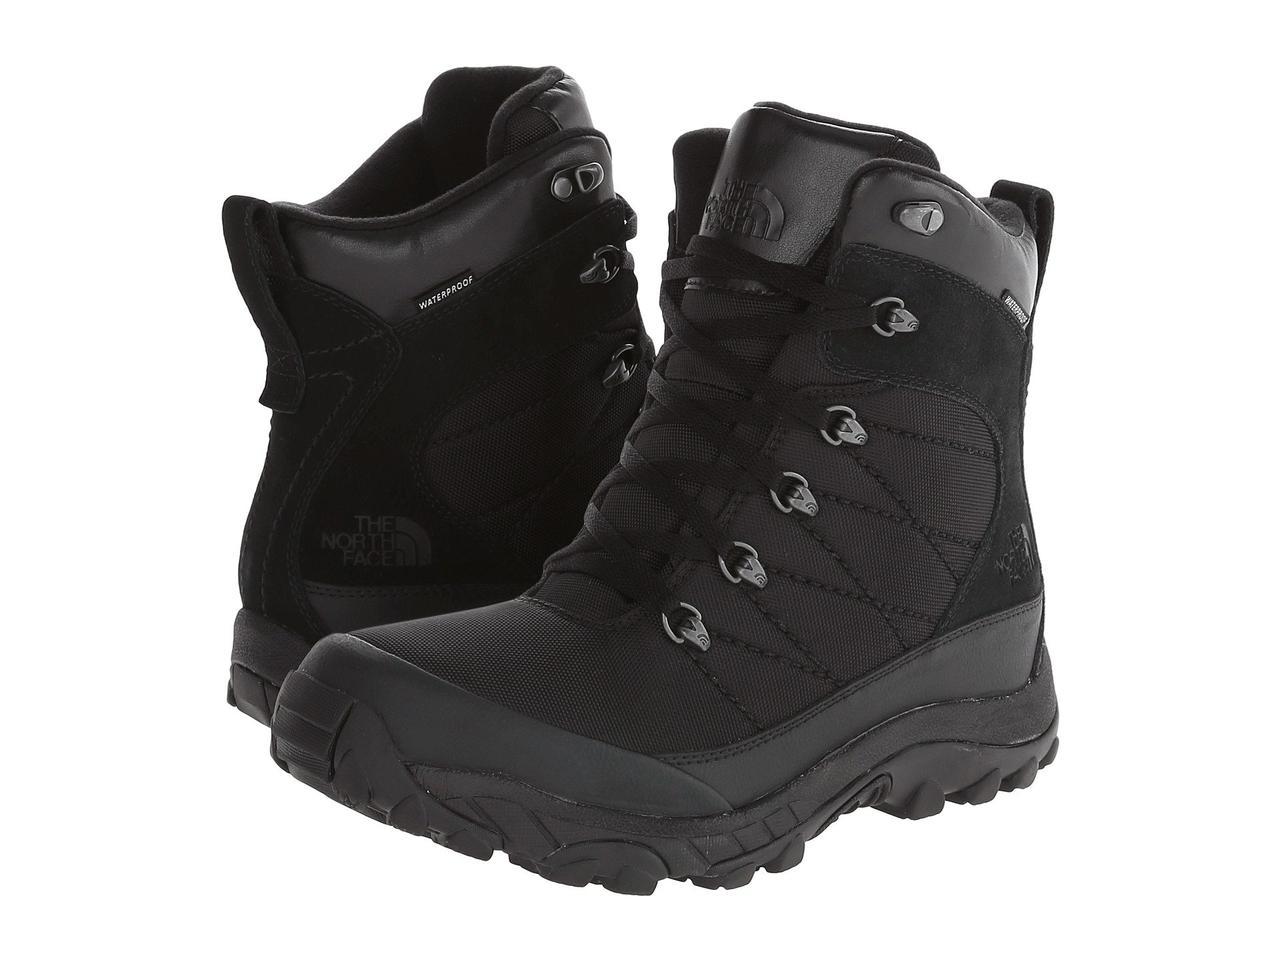 Ботинки/Сапоги (Оригинал) The North Face Chilkat Nylon TNF Black/TNF Black